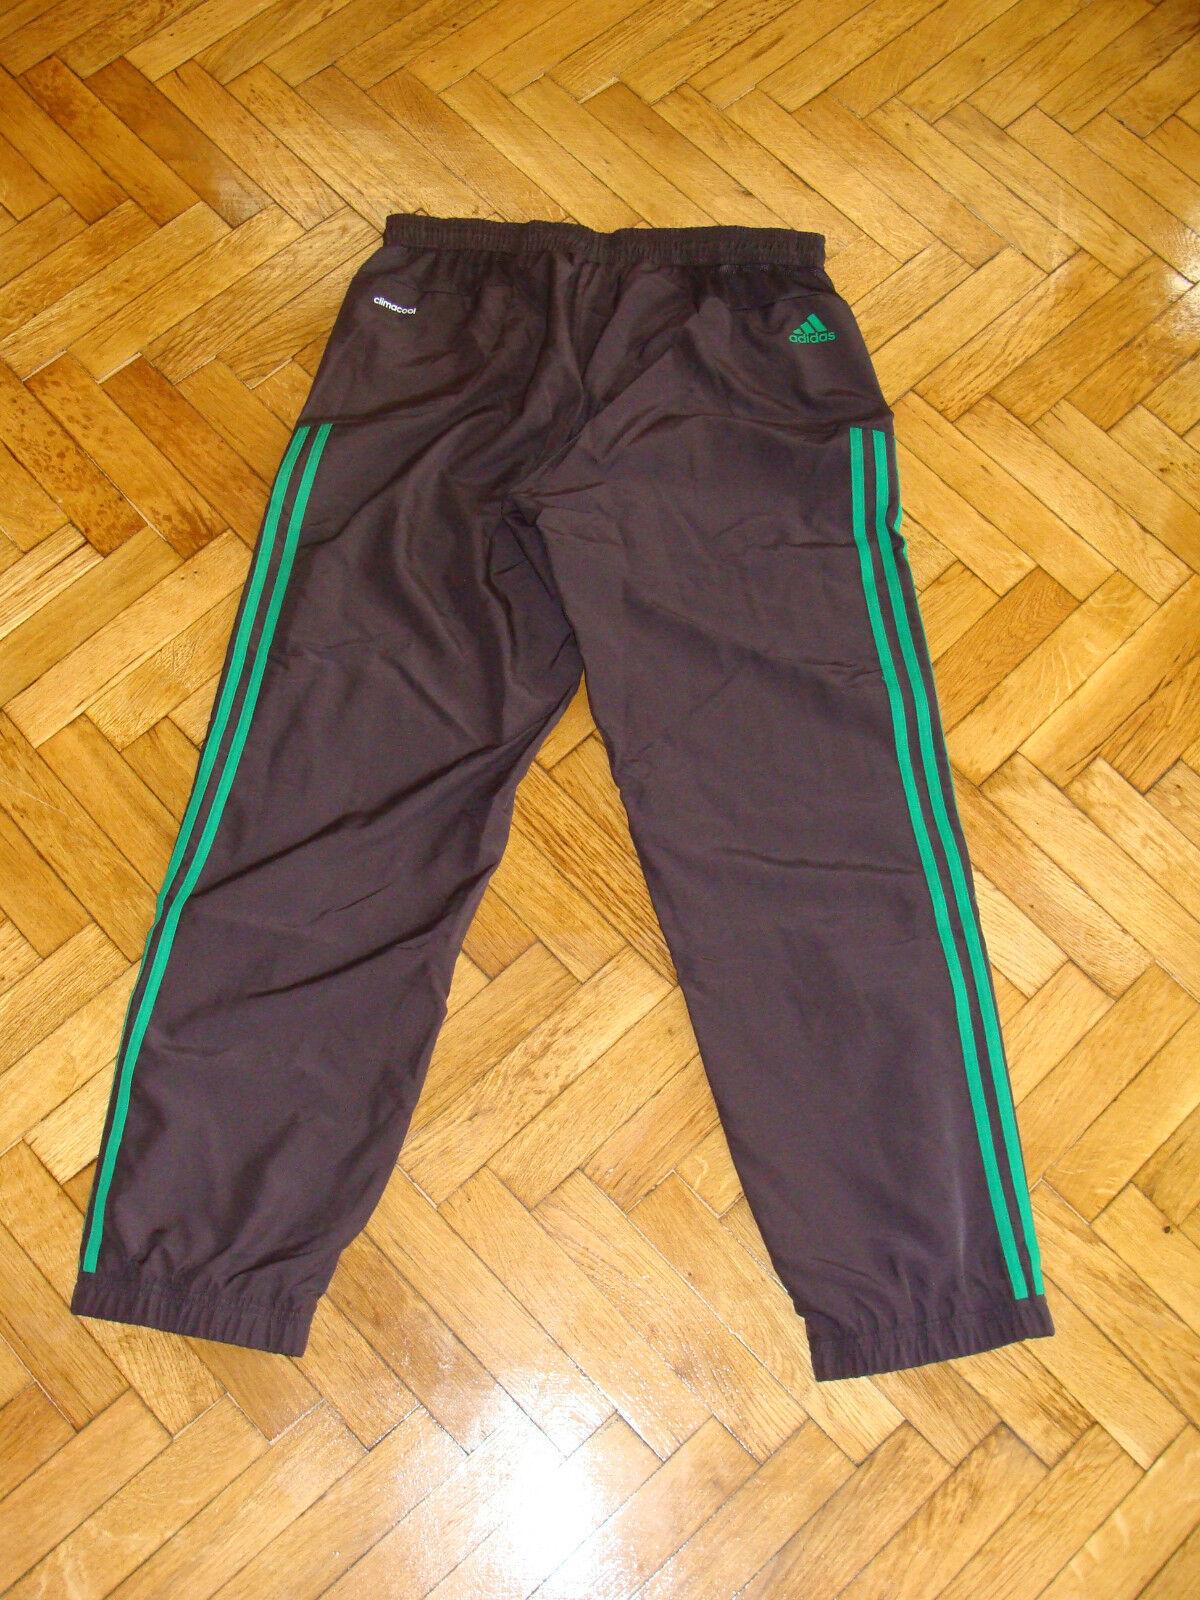 AC Milan Milano Calcio Tuta Italia Italia Italia Adidas Football Suit Champions League NUOVO | Ammenda Di Lavorazione  92990d